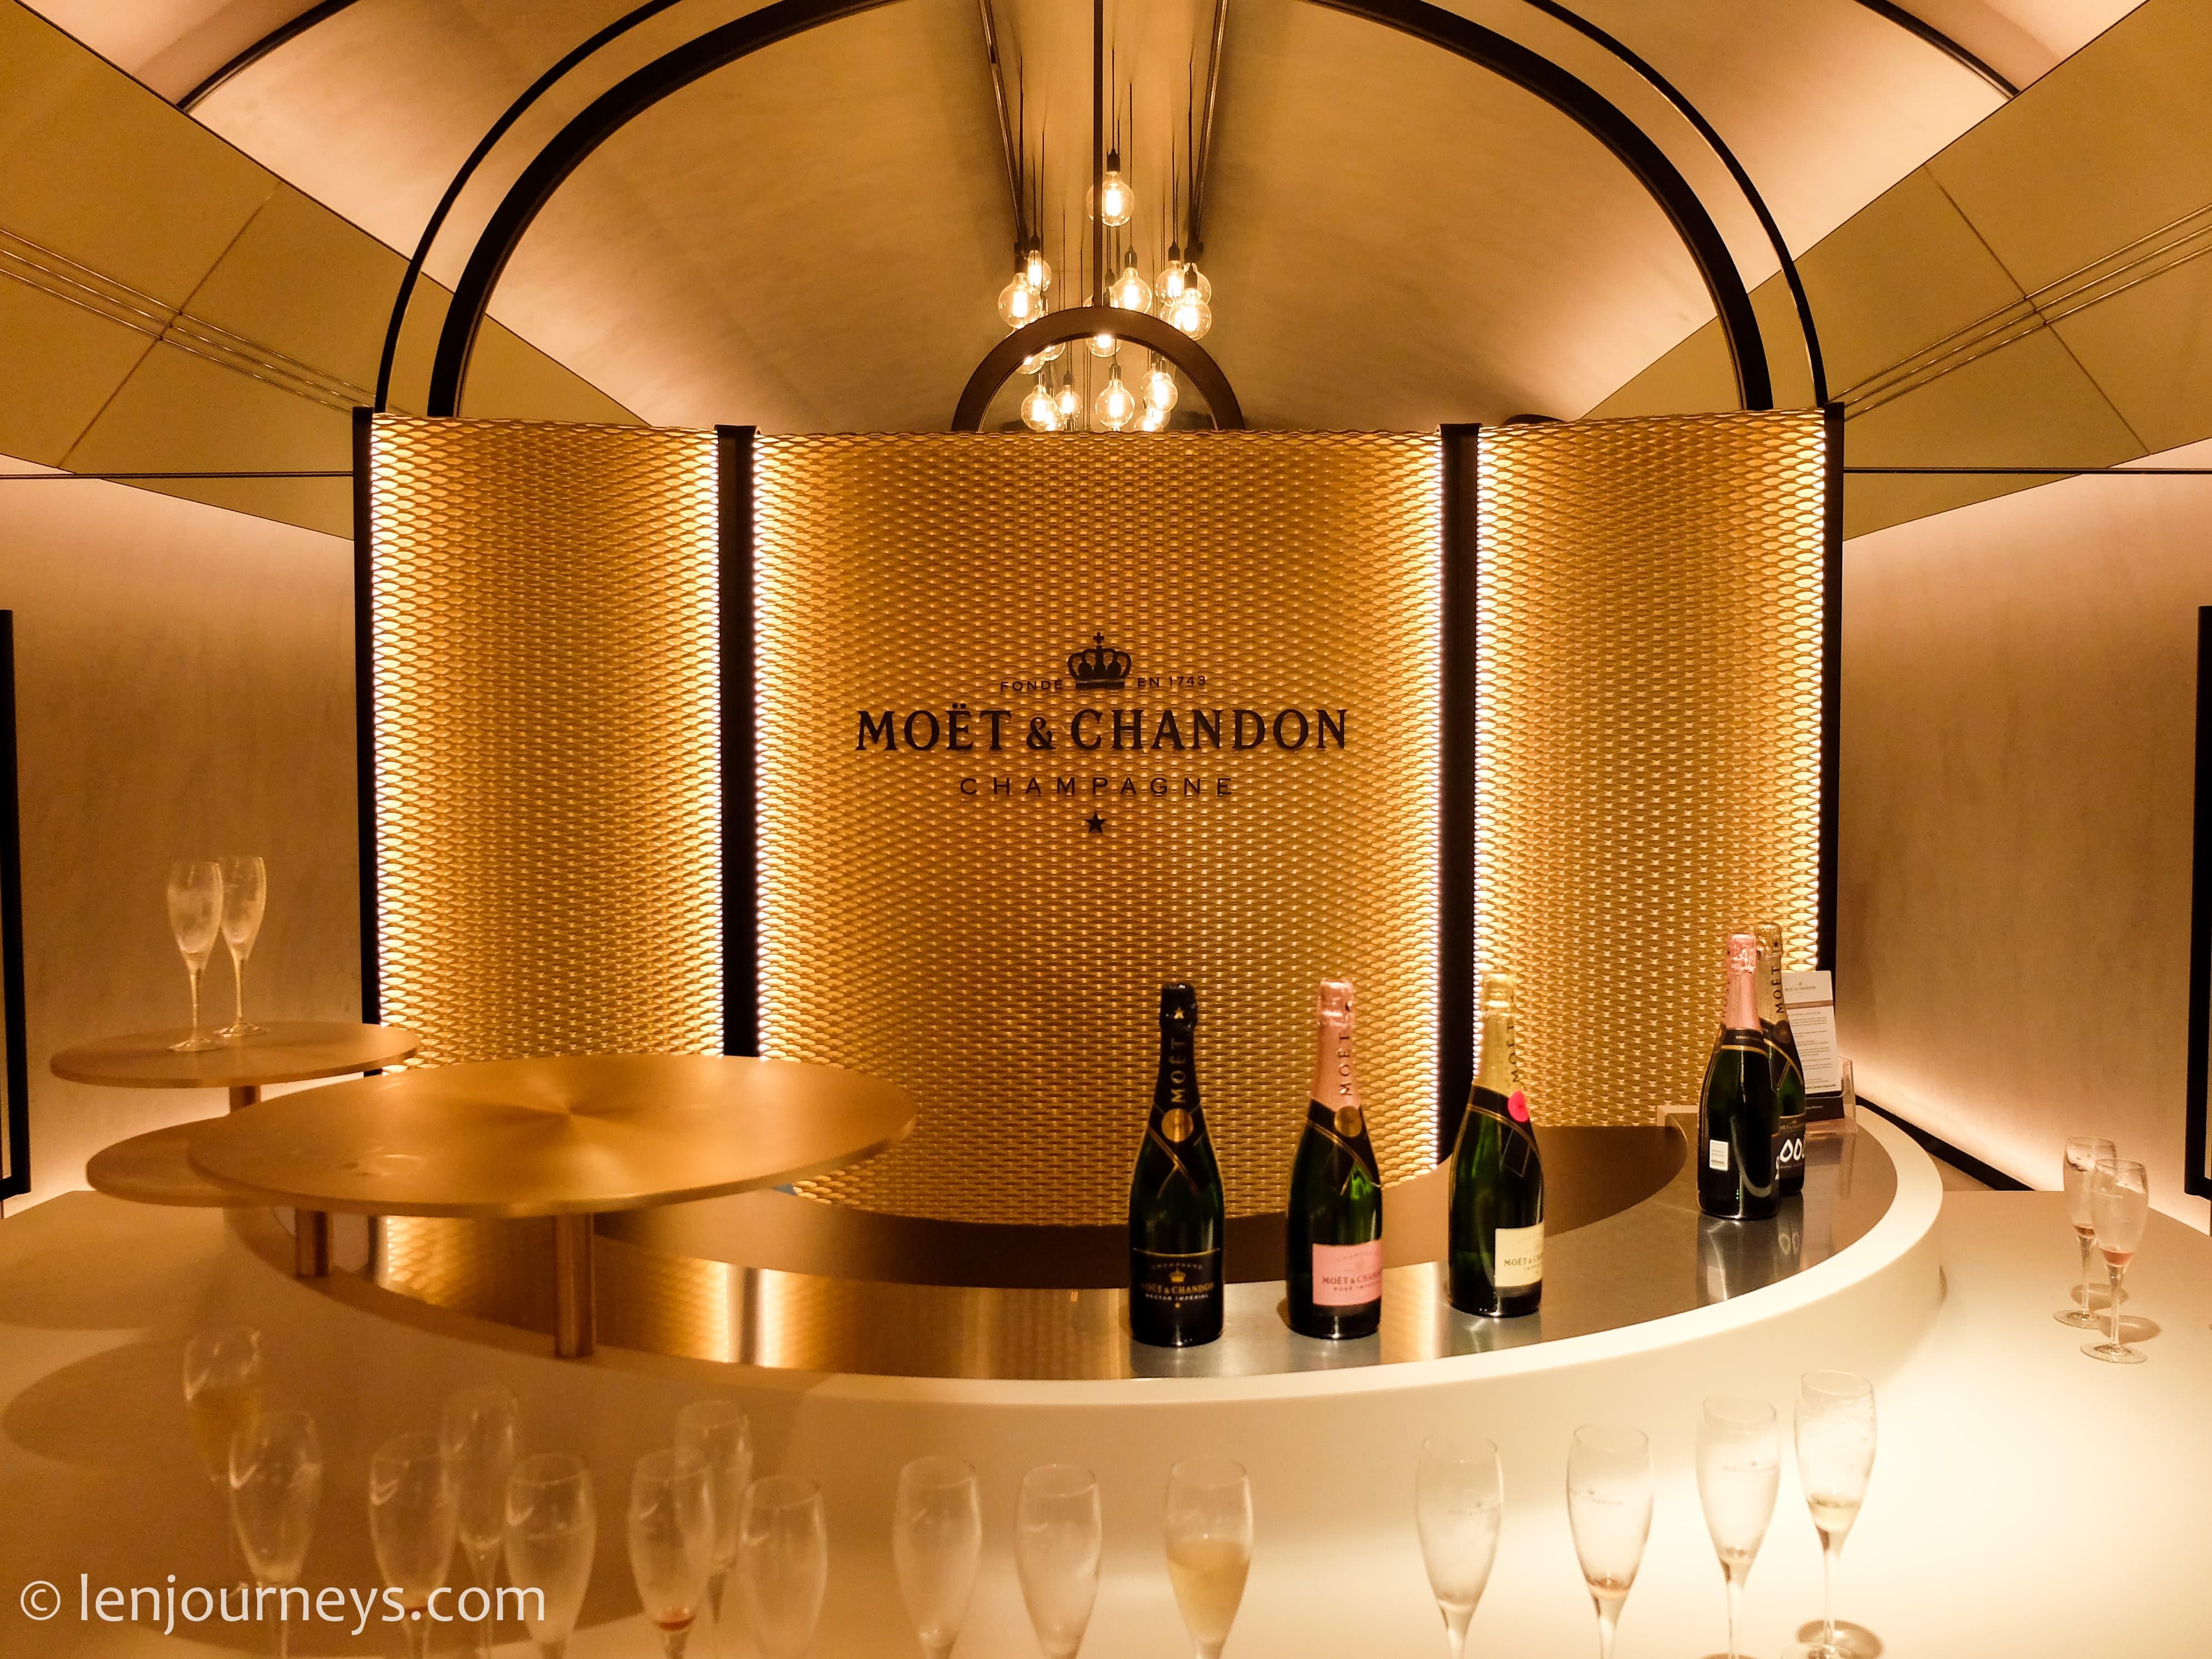 Tasting room in Moët and Chandon Mansion